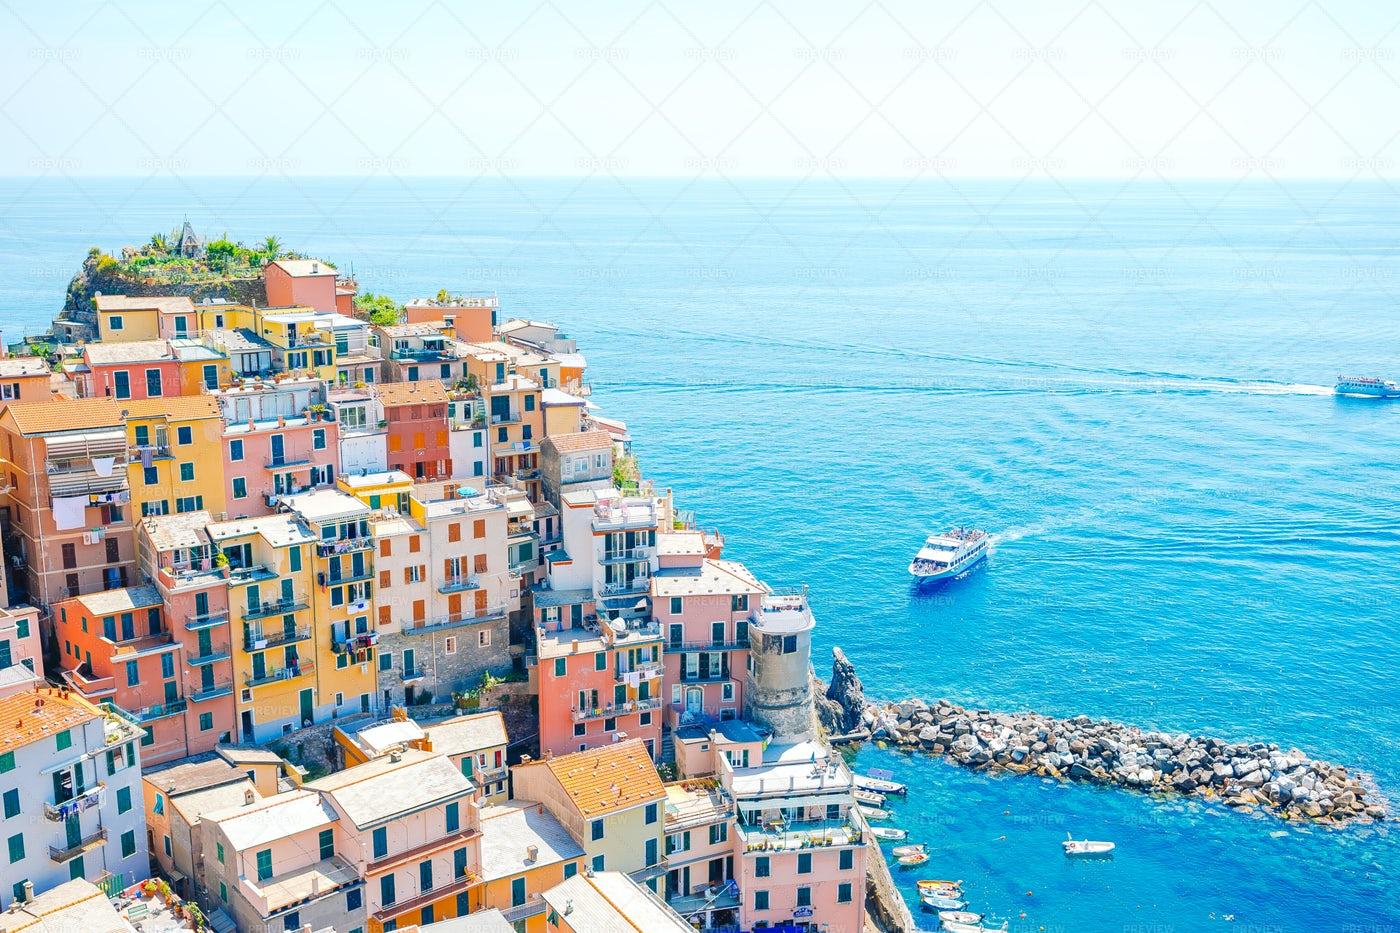 Colorful Village: Stock Photos